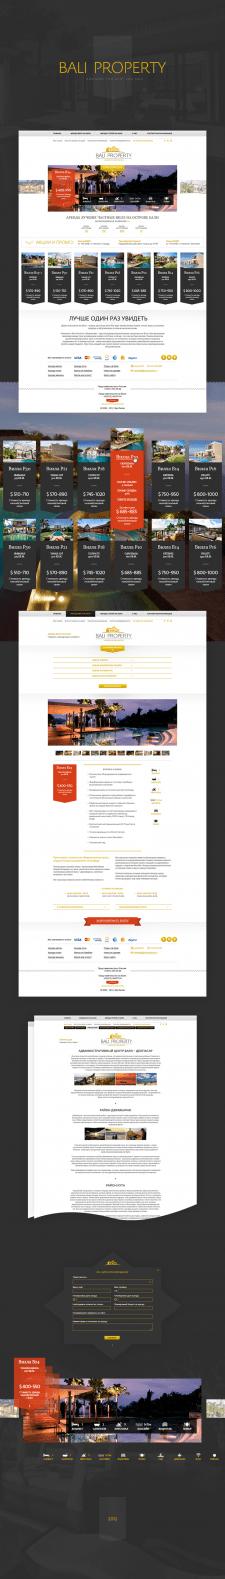 Bali Property. Advisors for Rent & Sale